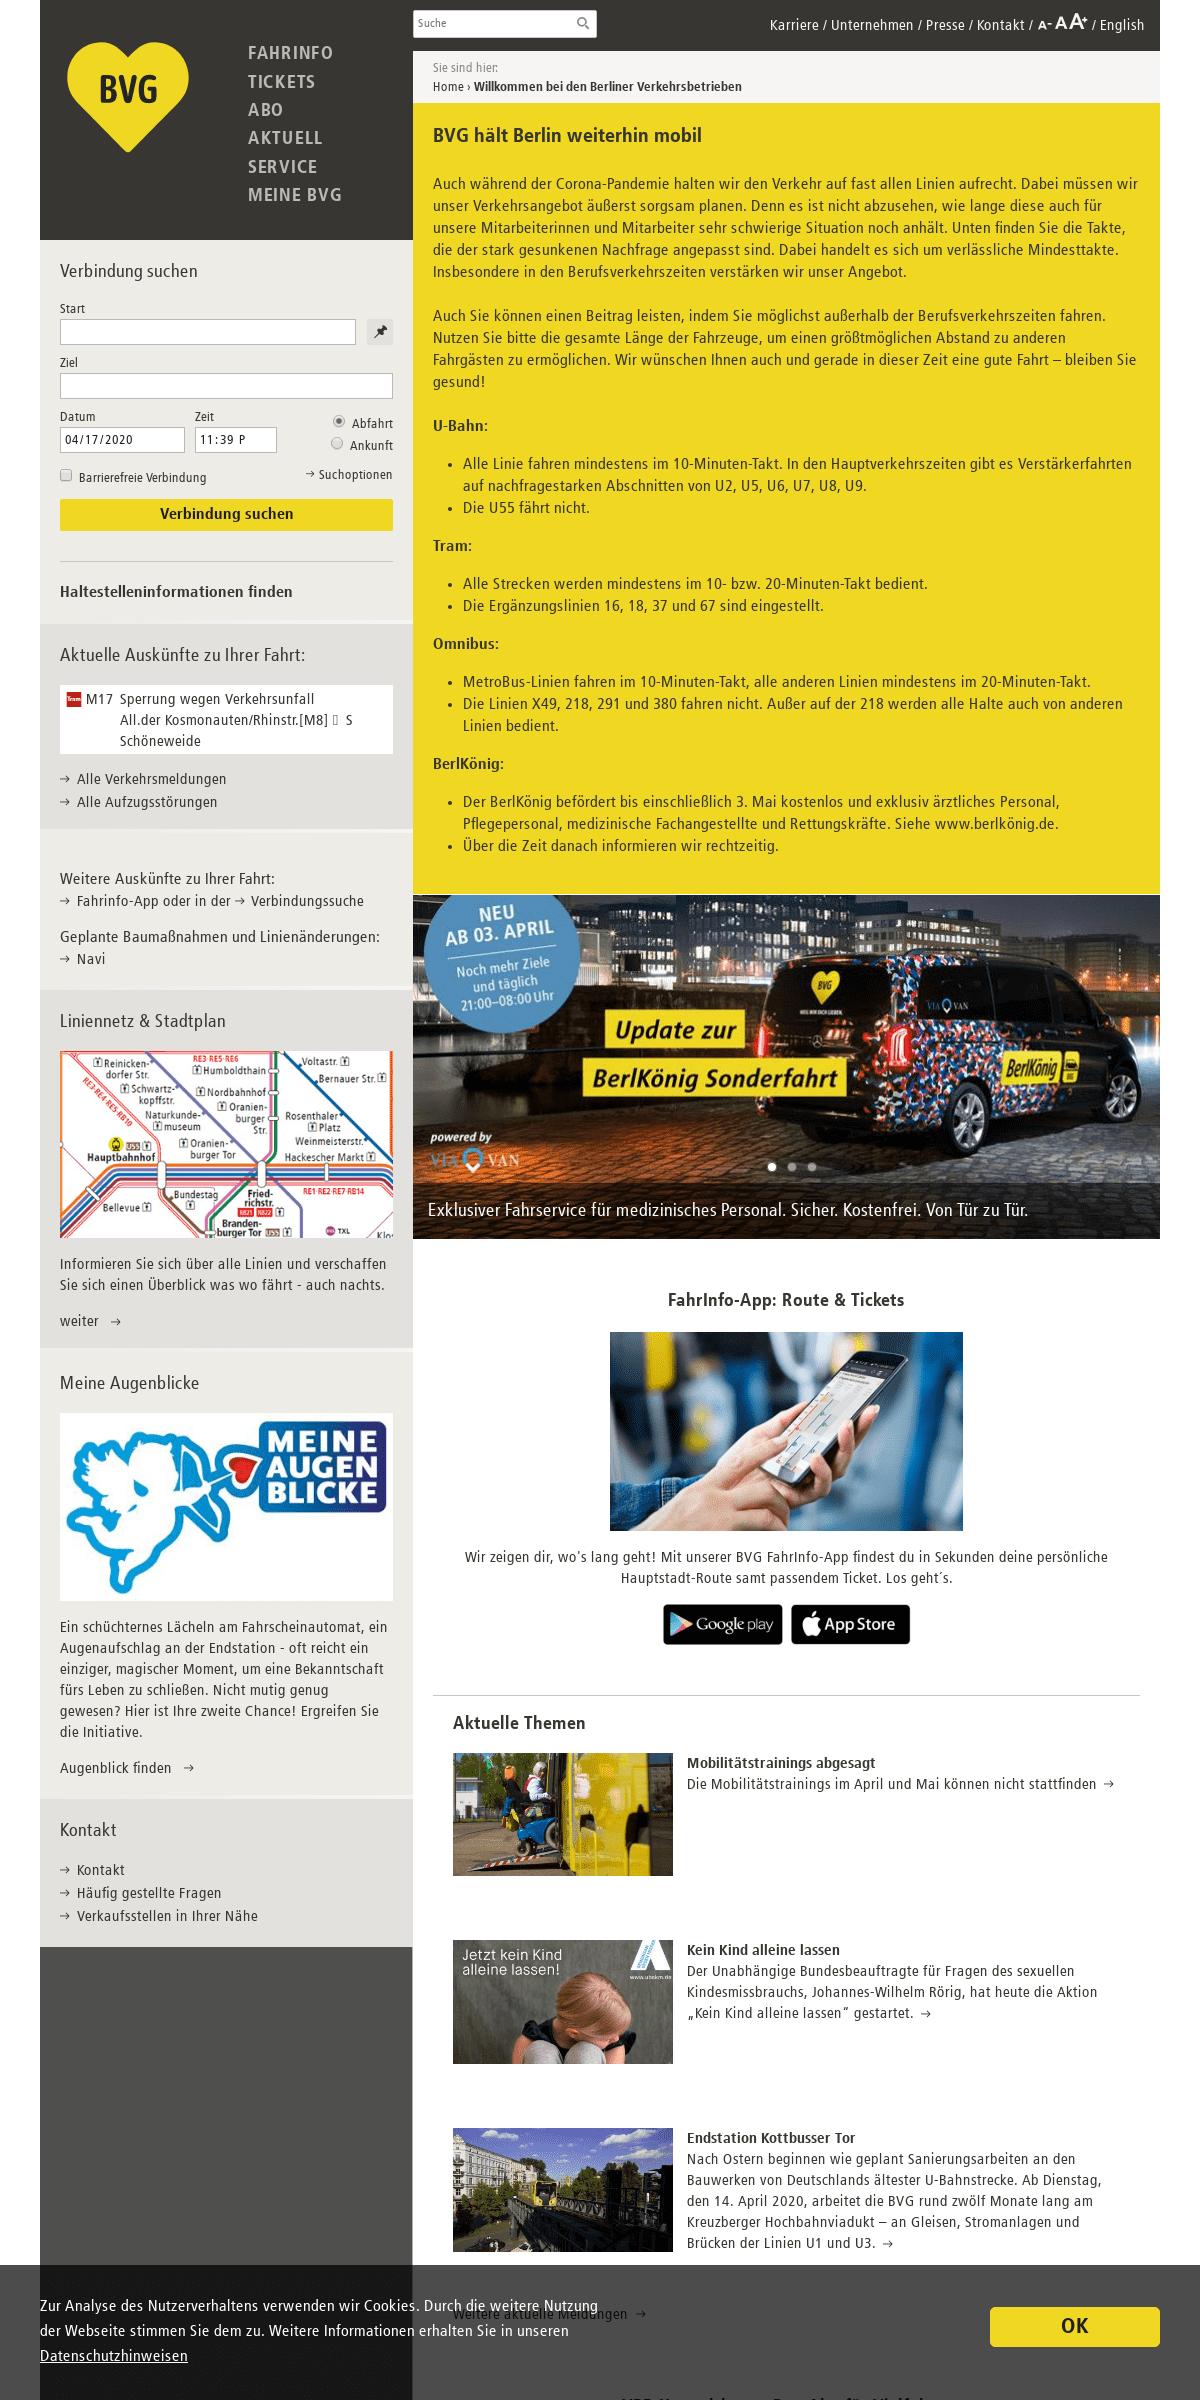 ArchiveBay.com - bvg.de - Willkommen bei den Berliner Verkehrsbetrieben - BVG